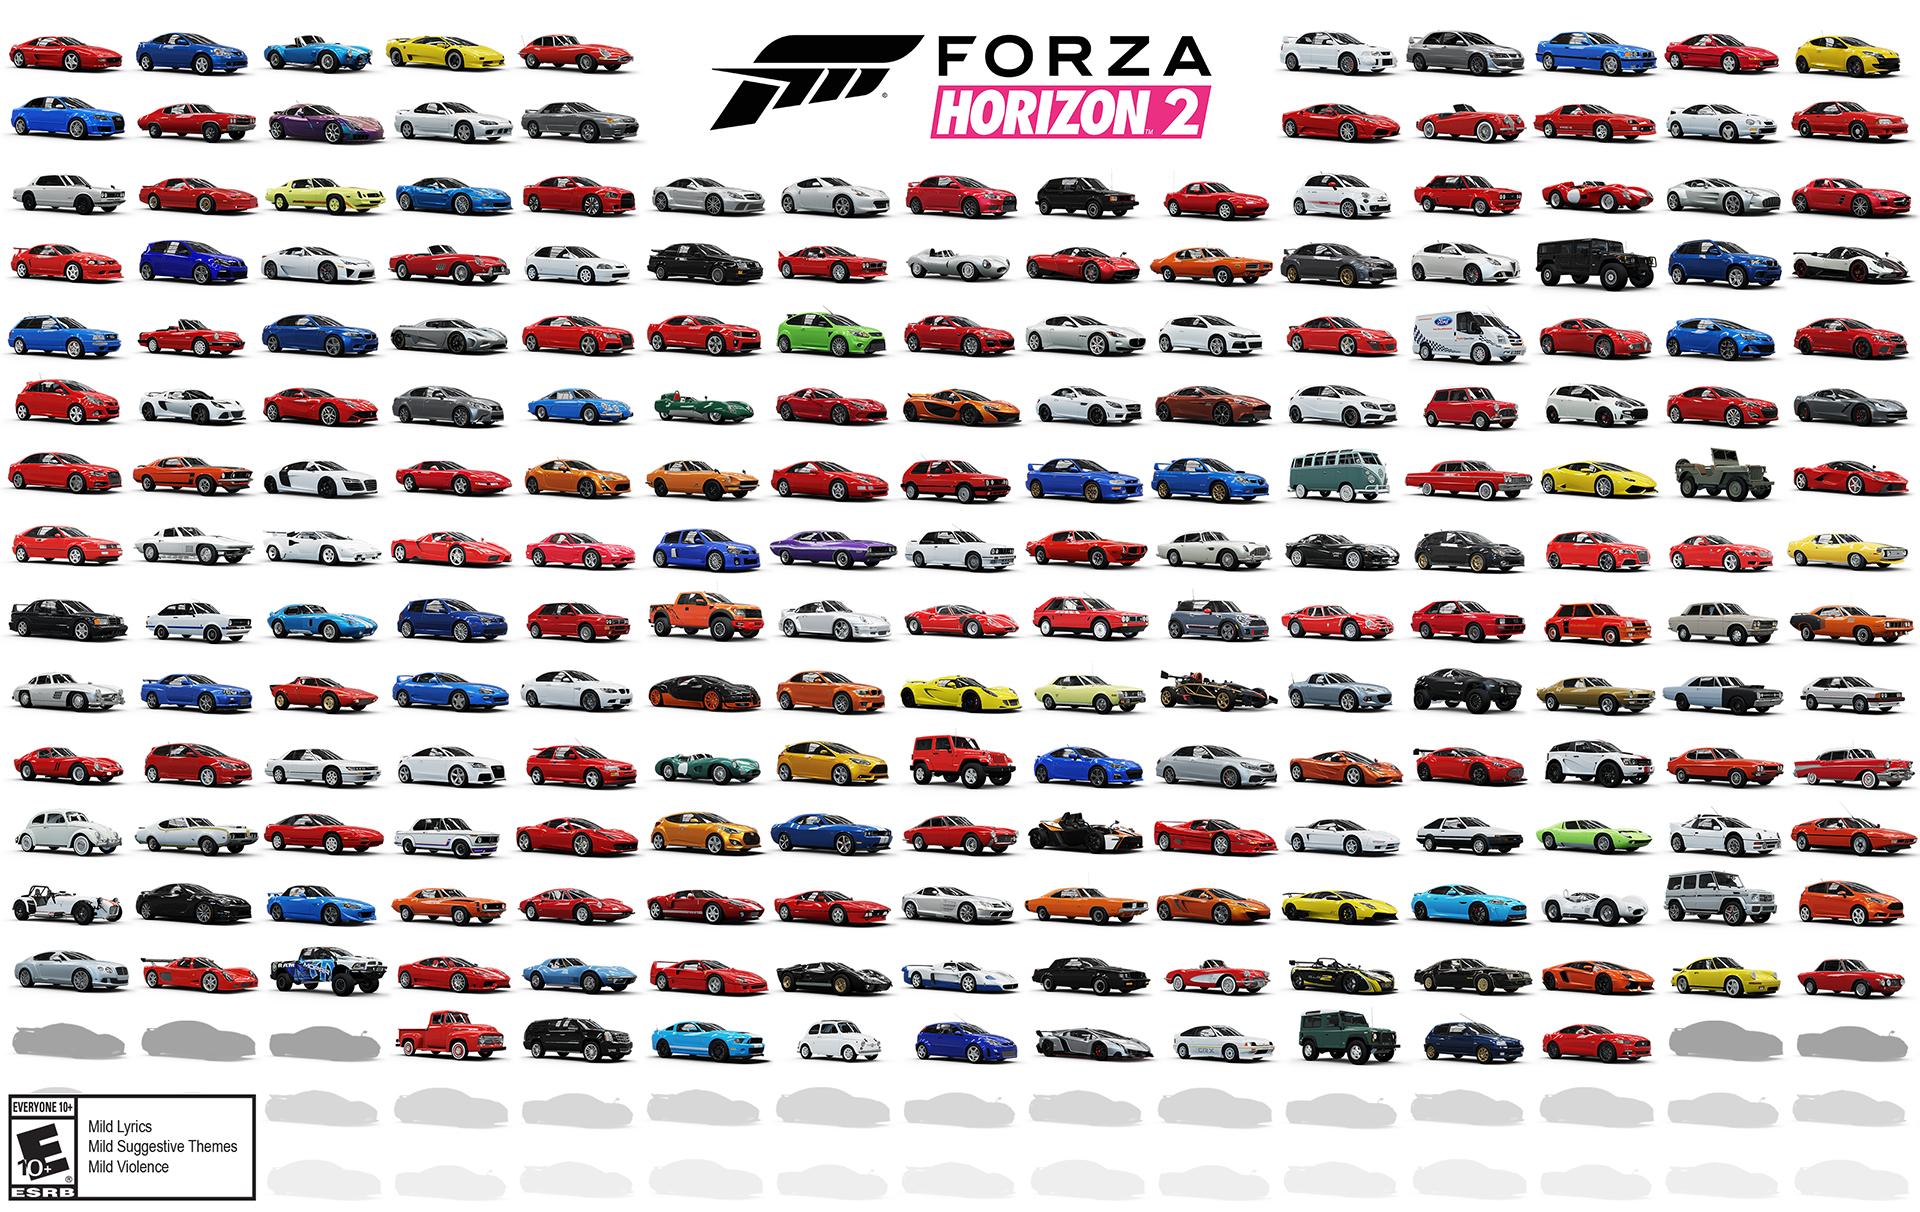 Forza Horizon 2 Cars Revealed